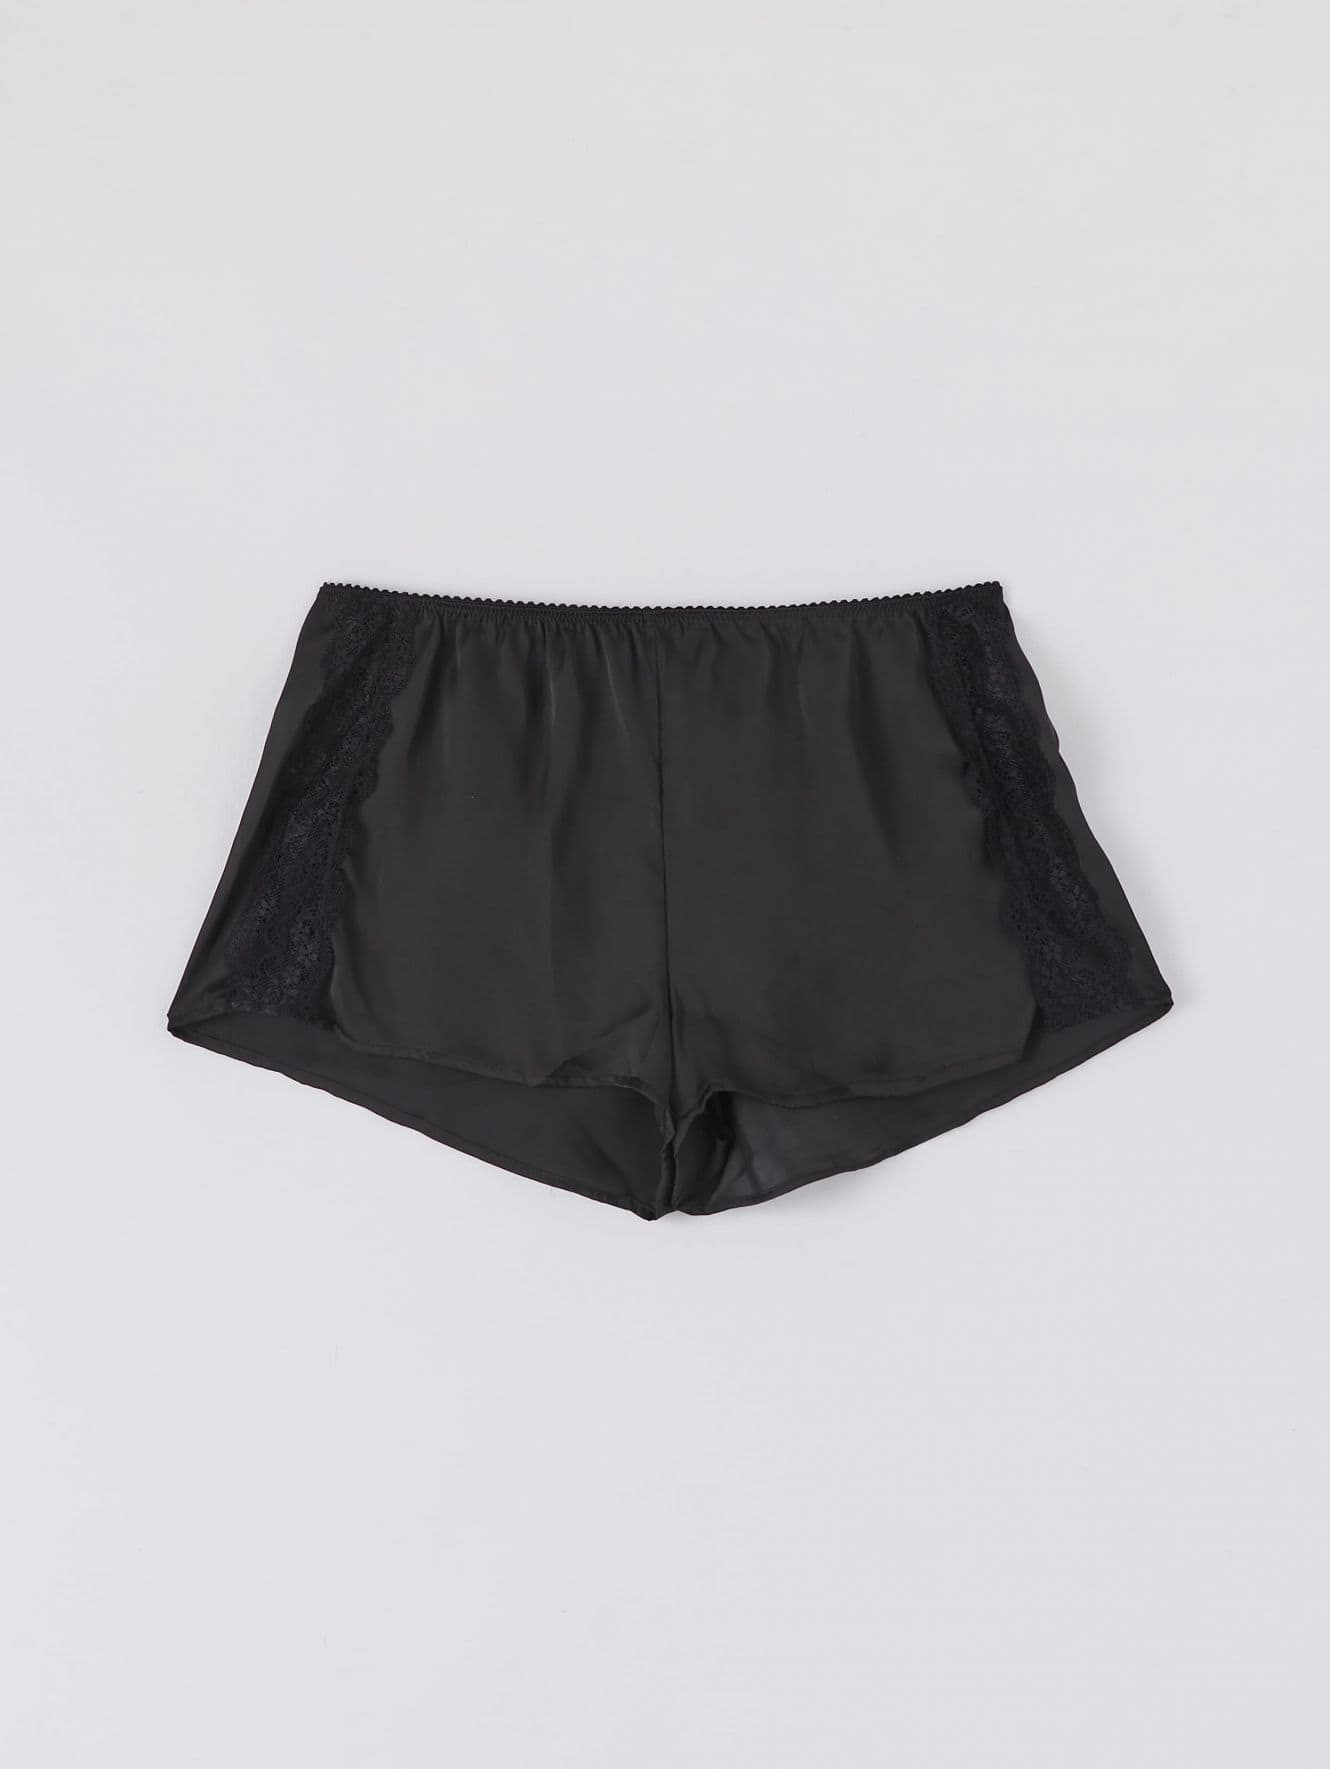 Pantalone Corto Femme Terranova